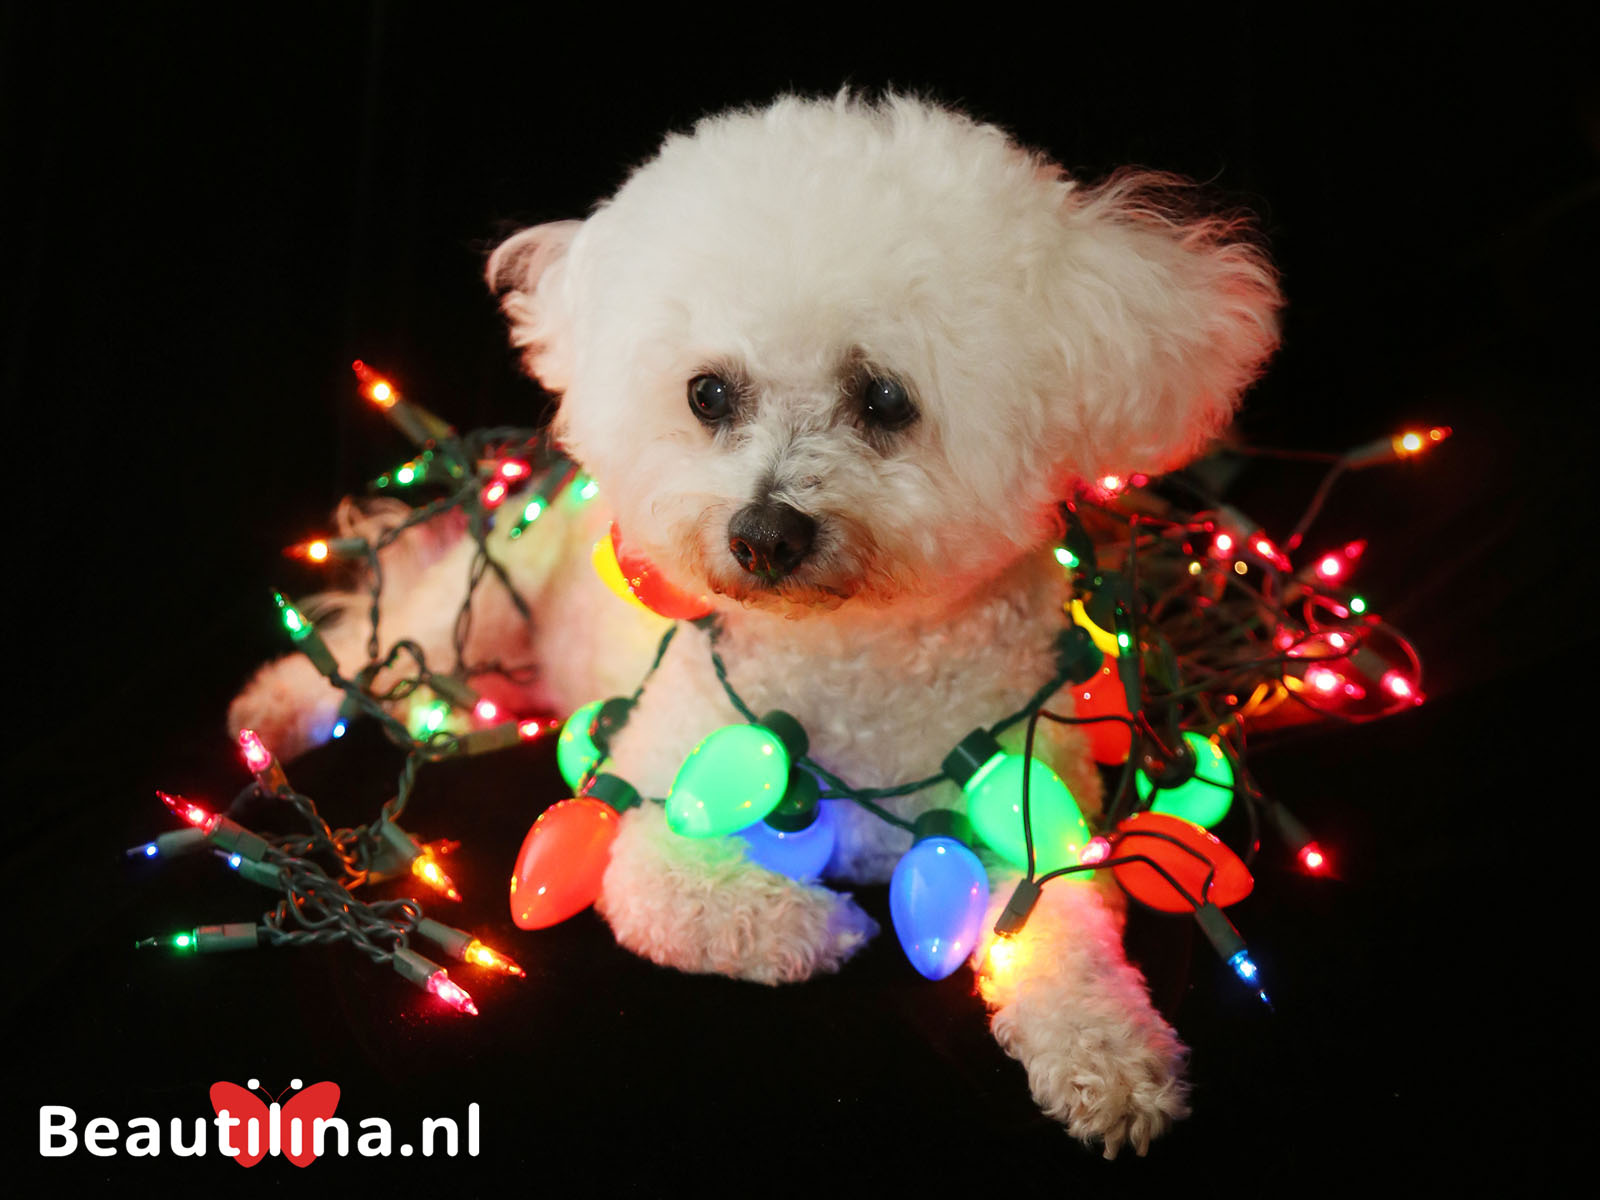 https://www.beautilina.nl/wp-content/uploads/bigstock-A-beautiful-Bichon-Frise-Dog-s-170004407-1600-x-1200.jpg